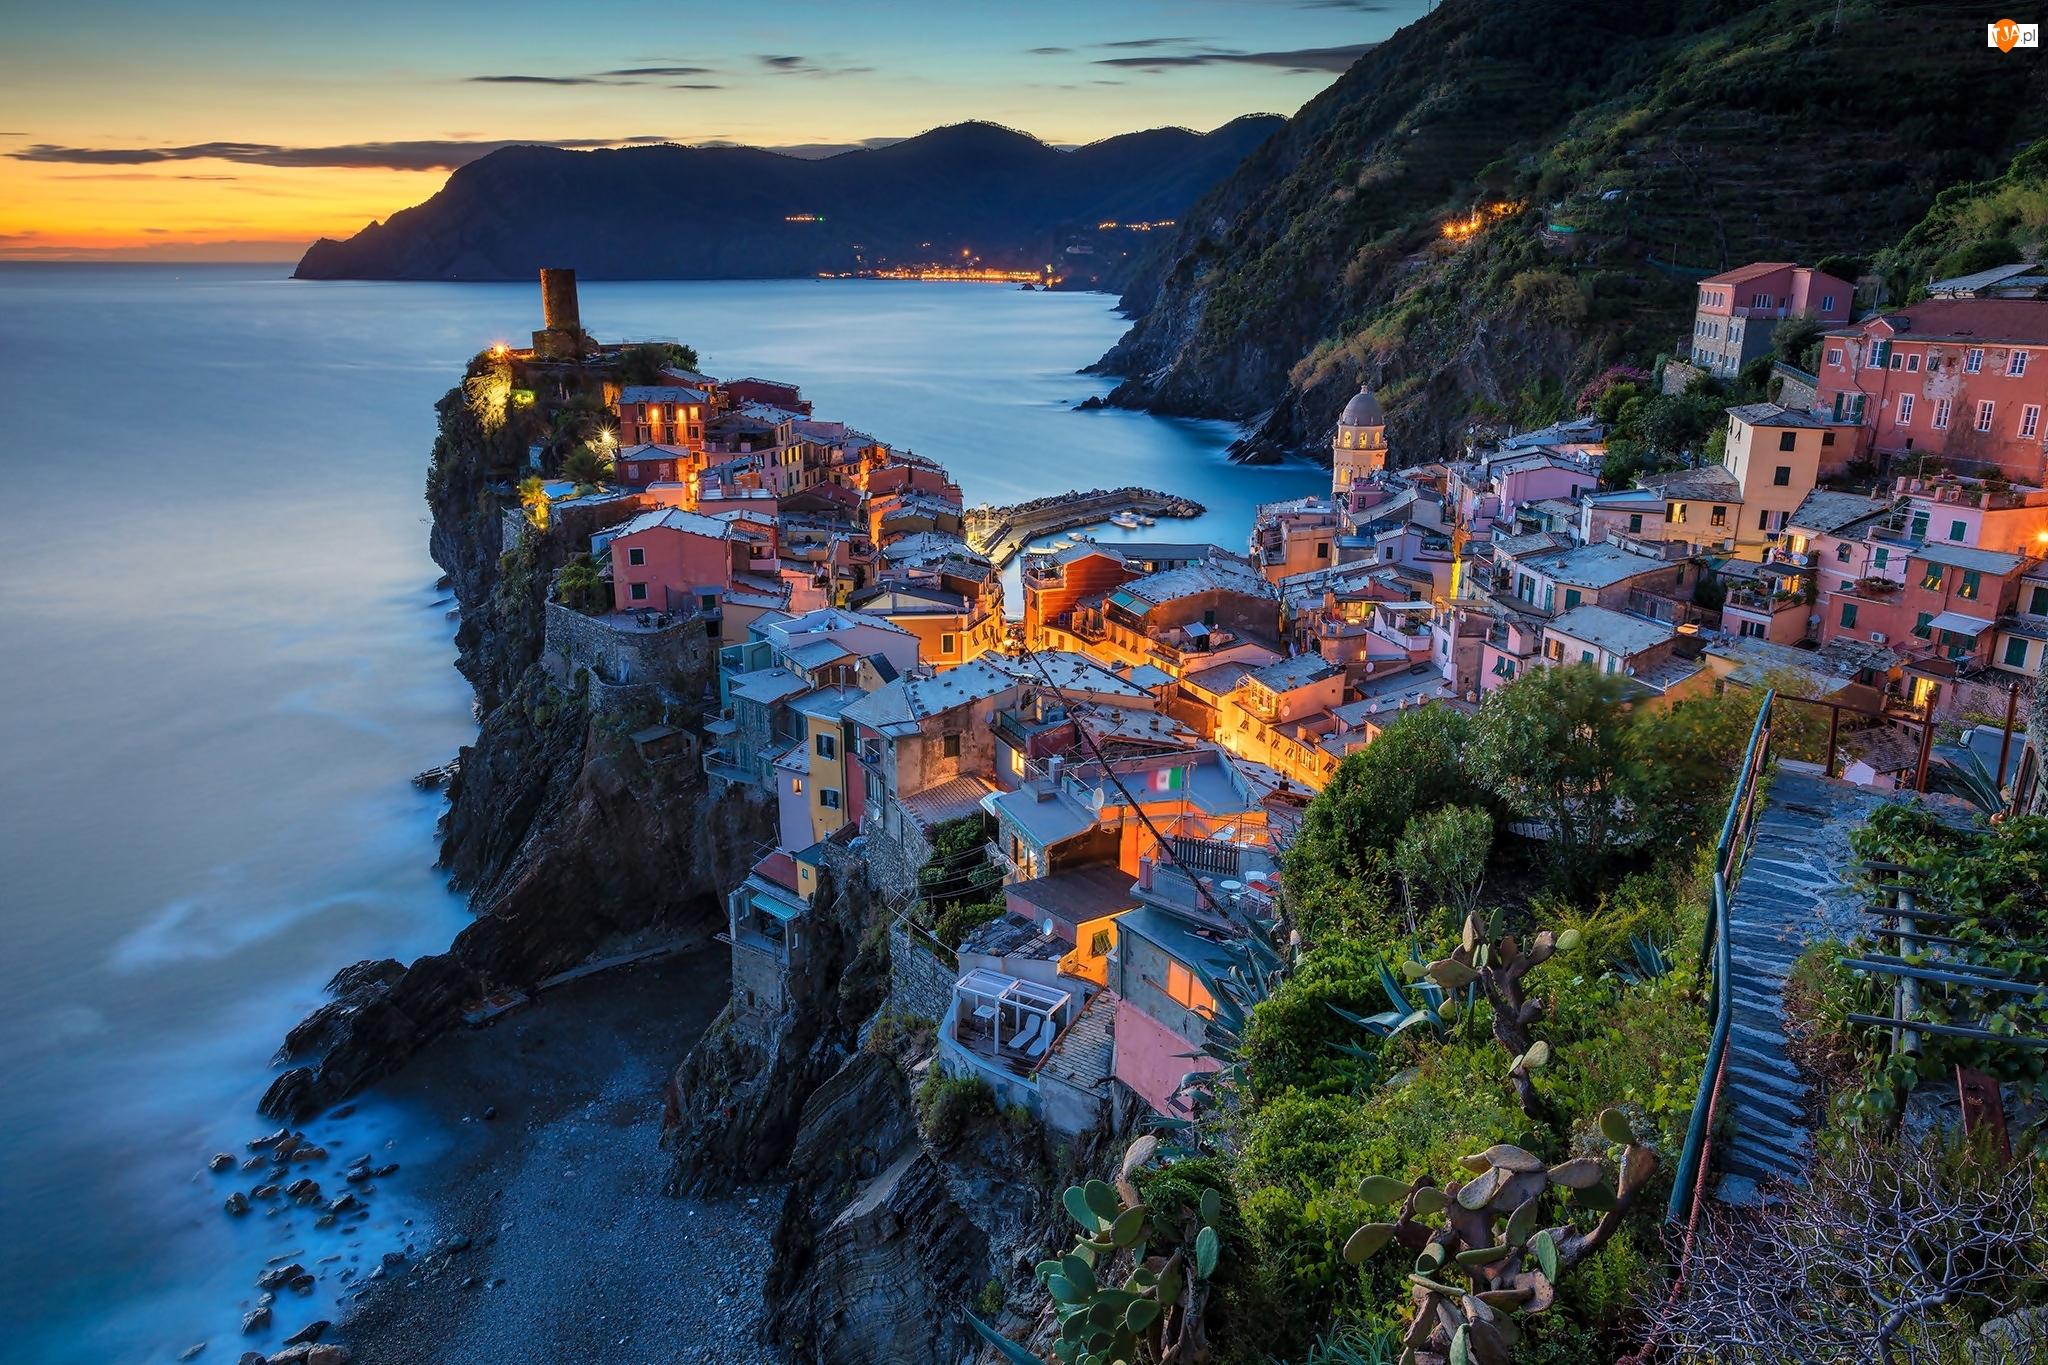 Morze, Domy, Cinque Terre, Włochy, Noc, Vernazza, Góry